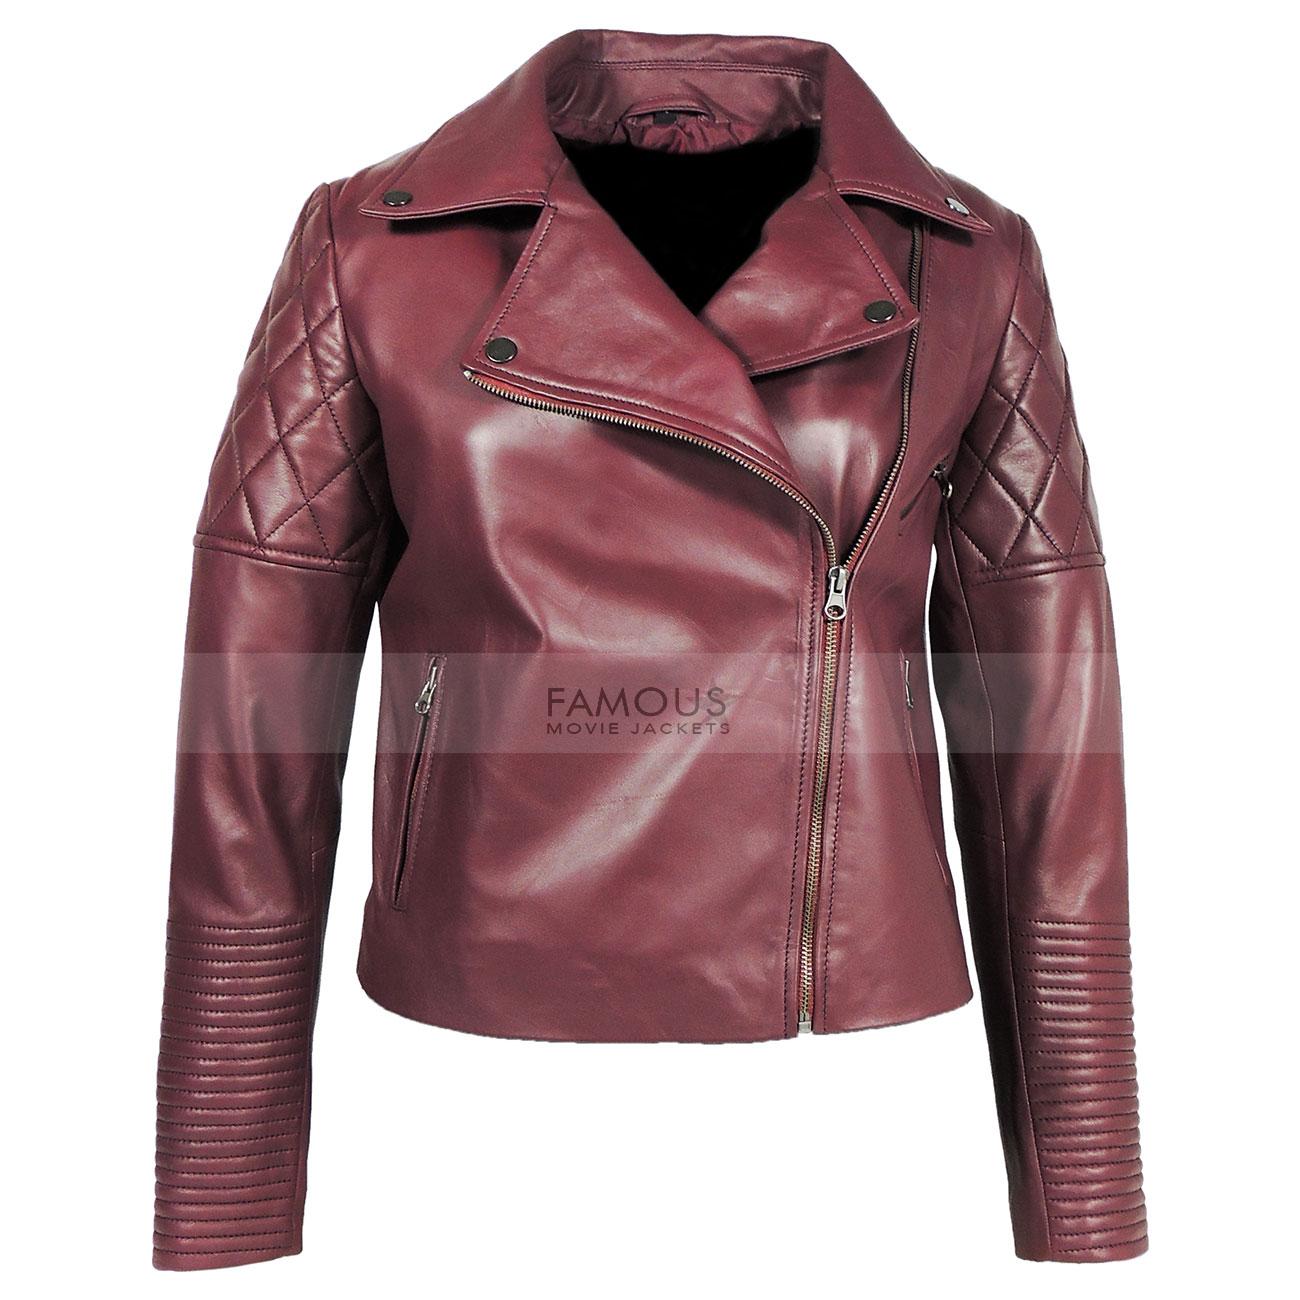 Fifty-Shades-of-Grey-Dakota-Johnson-Jacket1